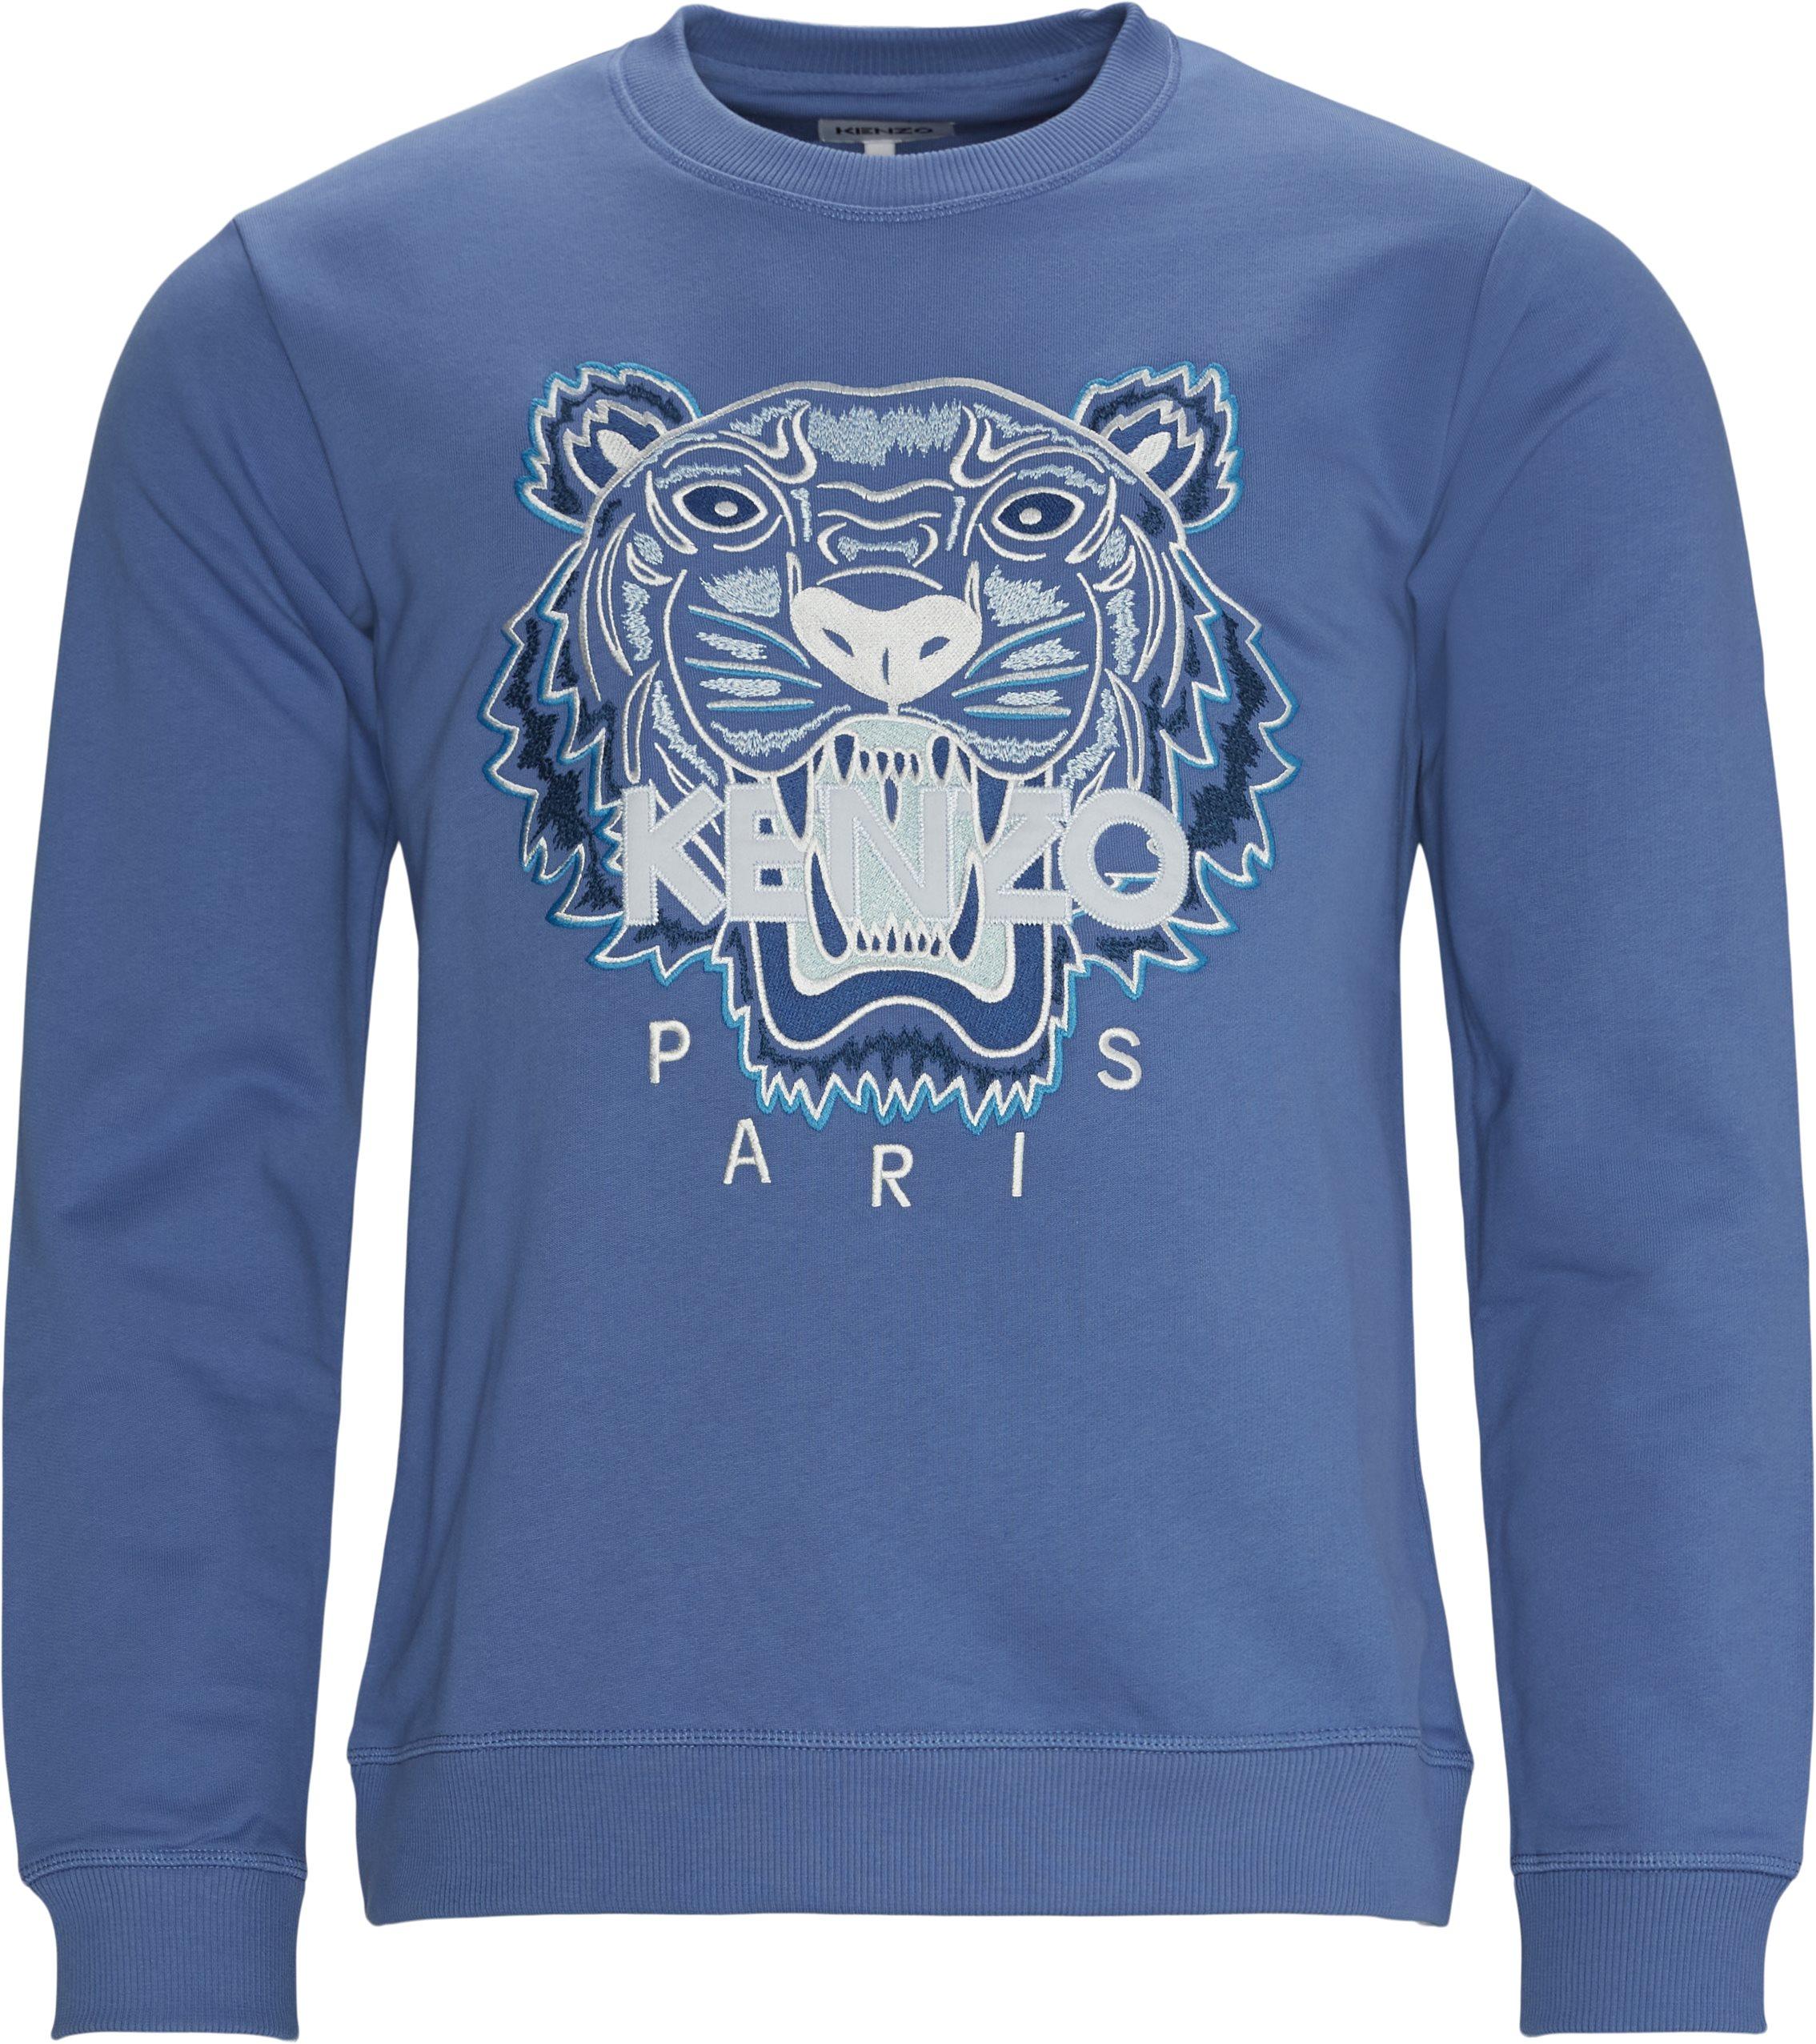 Tiger Sweatshirt - Sweatshirts - Regular fit - Blå